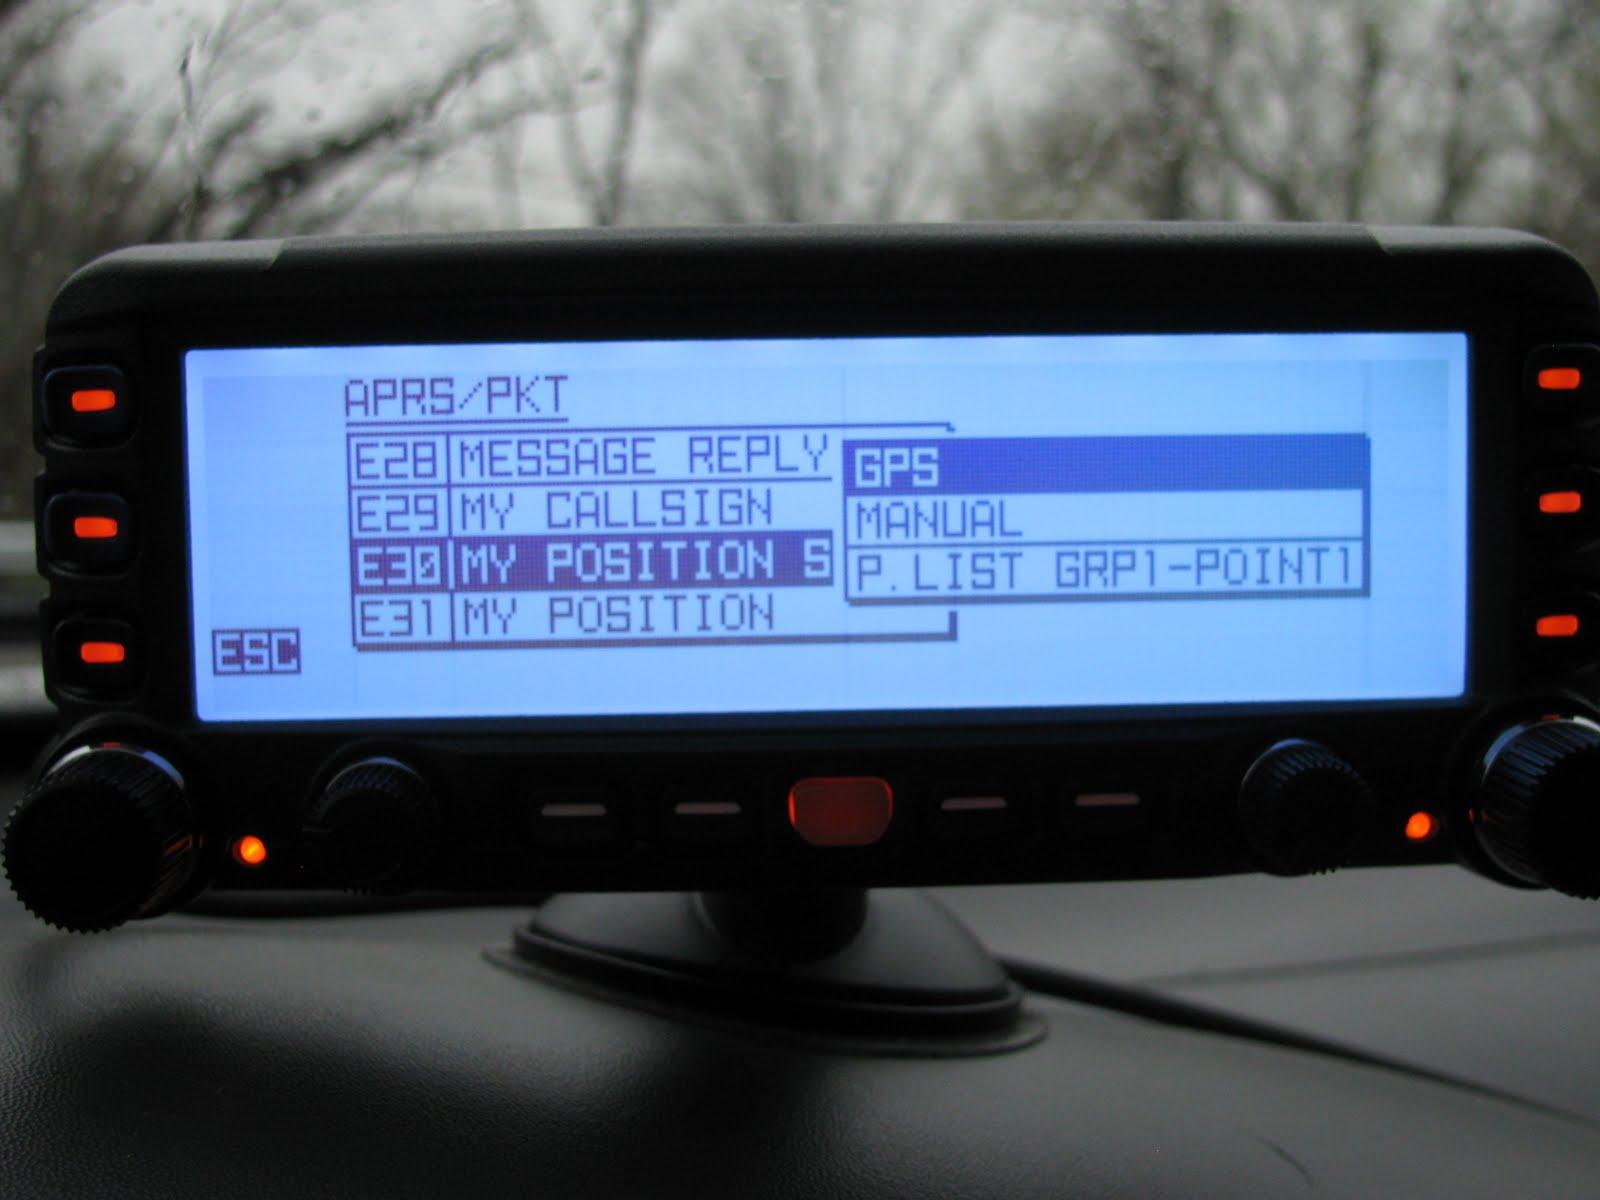 KD8KSN QRV: Configuring APRS on the Yaesu FTM-350AR